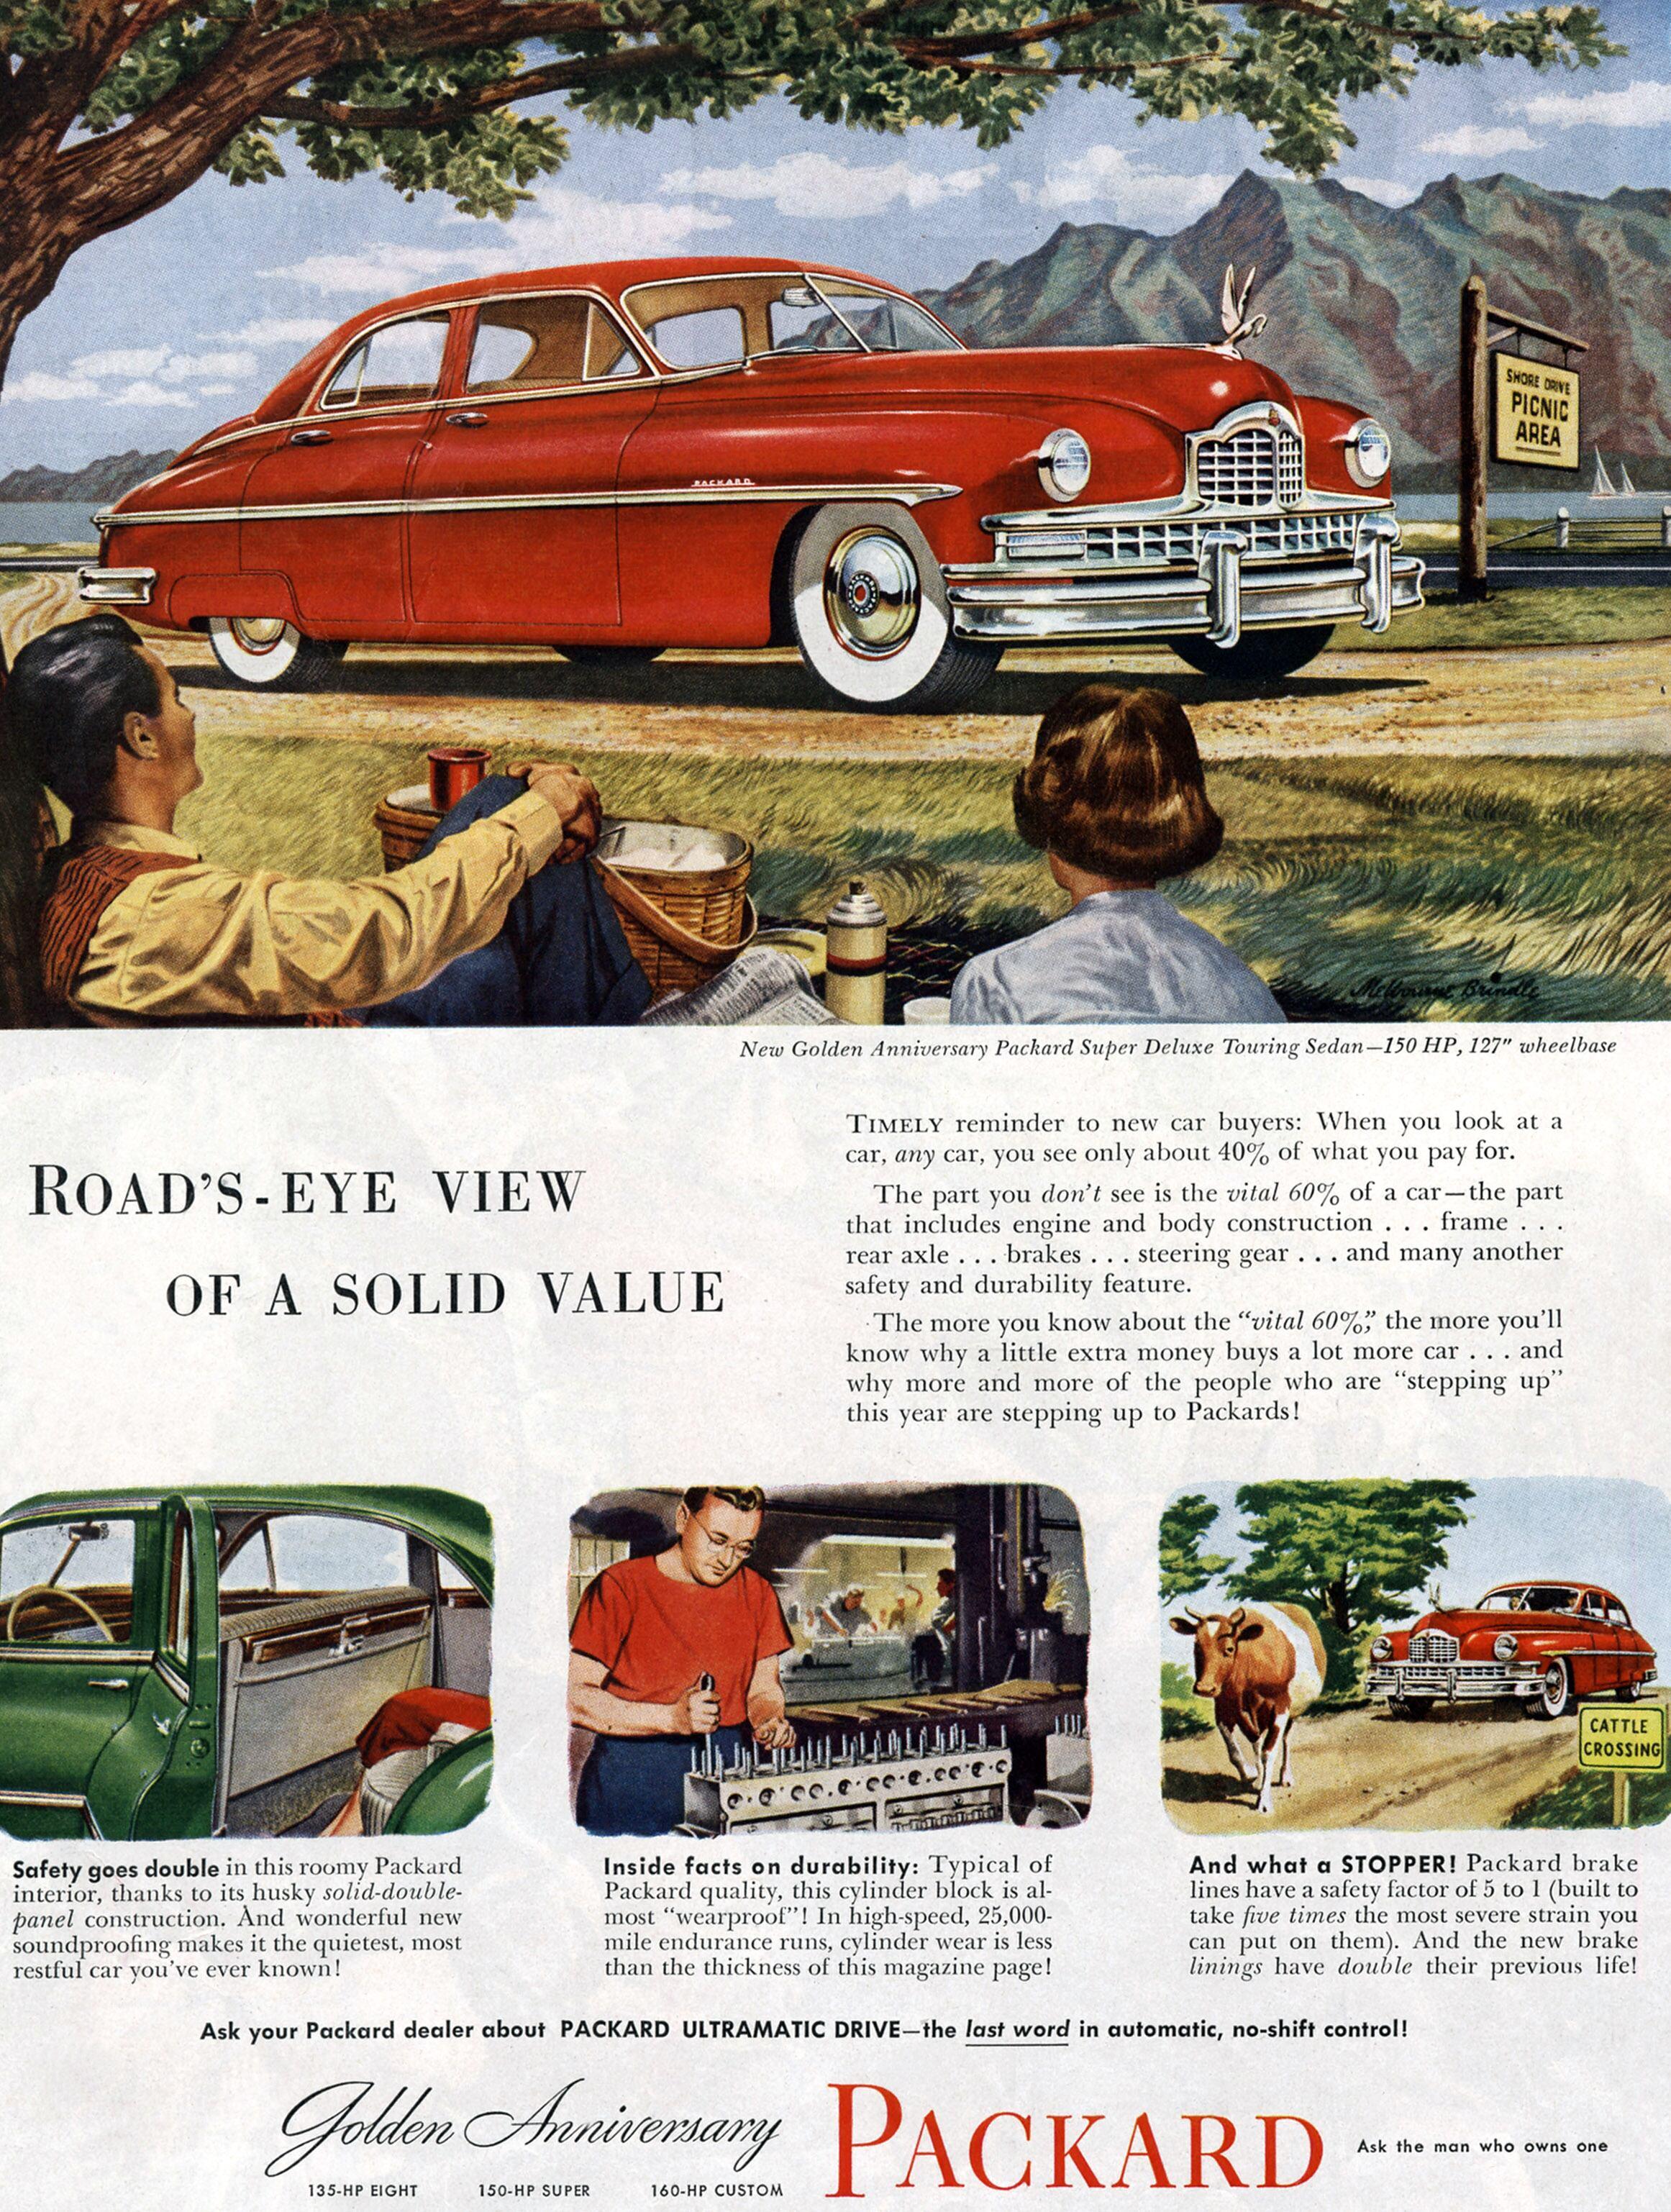 Packard Super Deluxe Touring Sedan